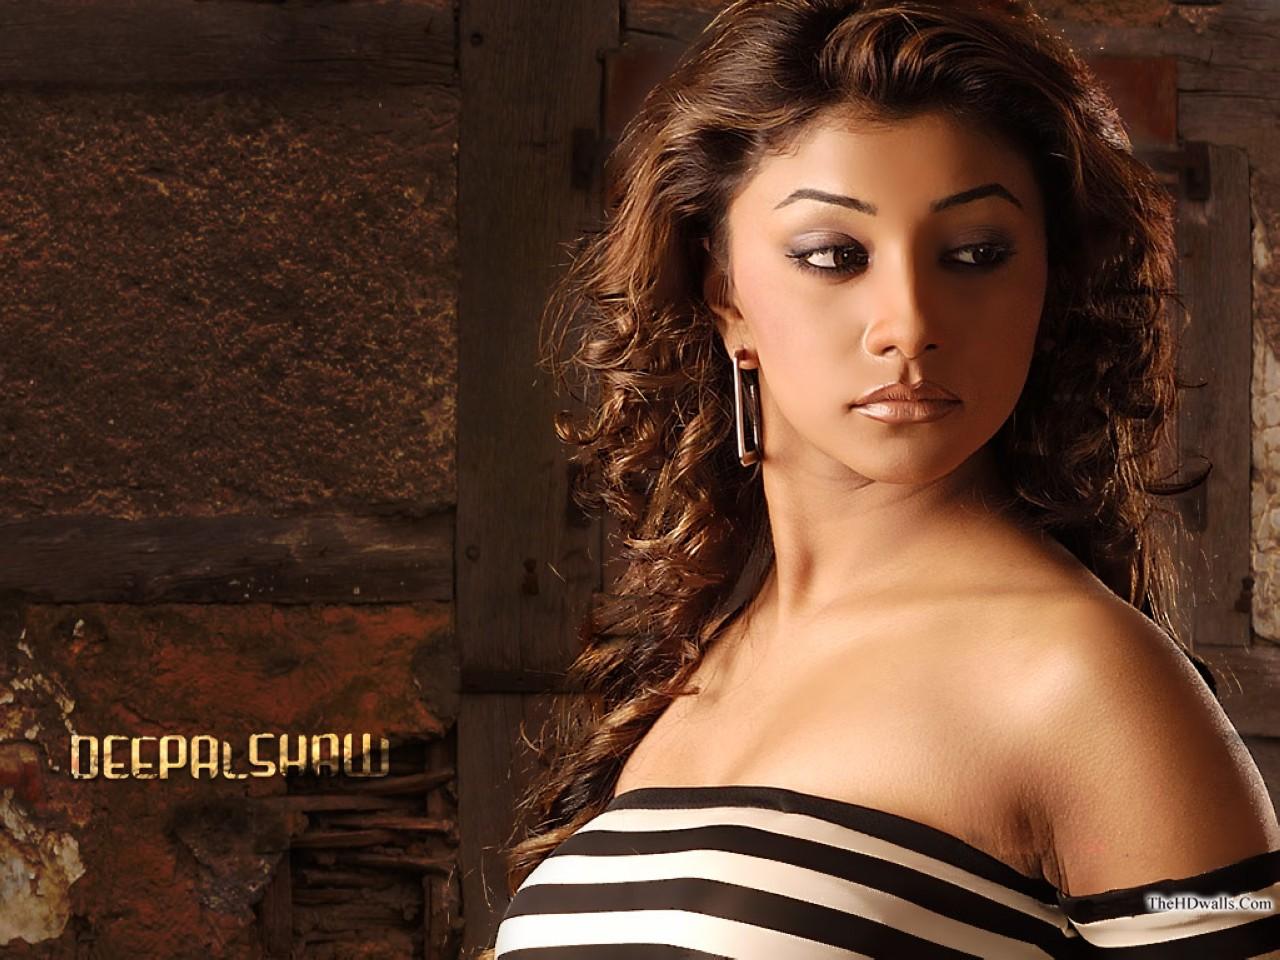 Bollywood Deepal Shaw wallpapers Abjmuzsu